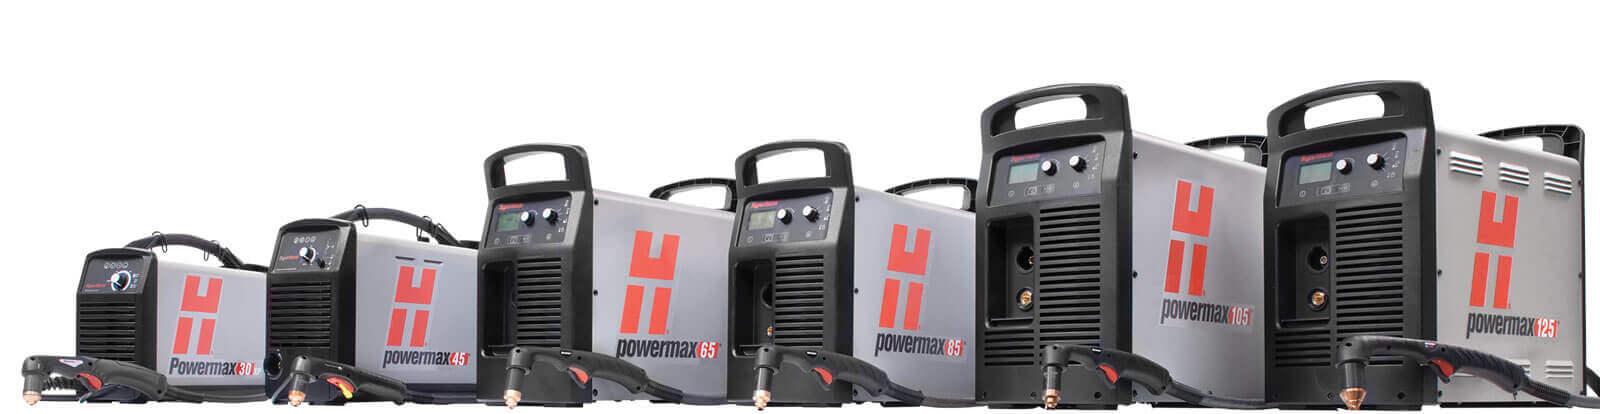 Powermax Handheld Plasma Cutters